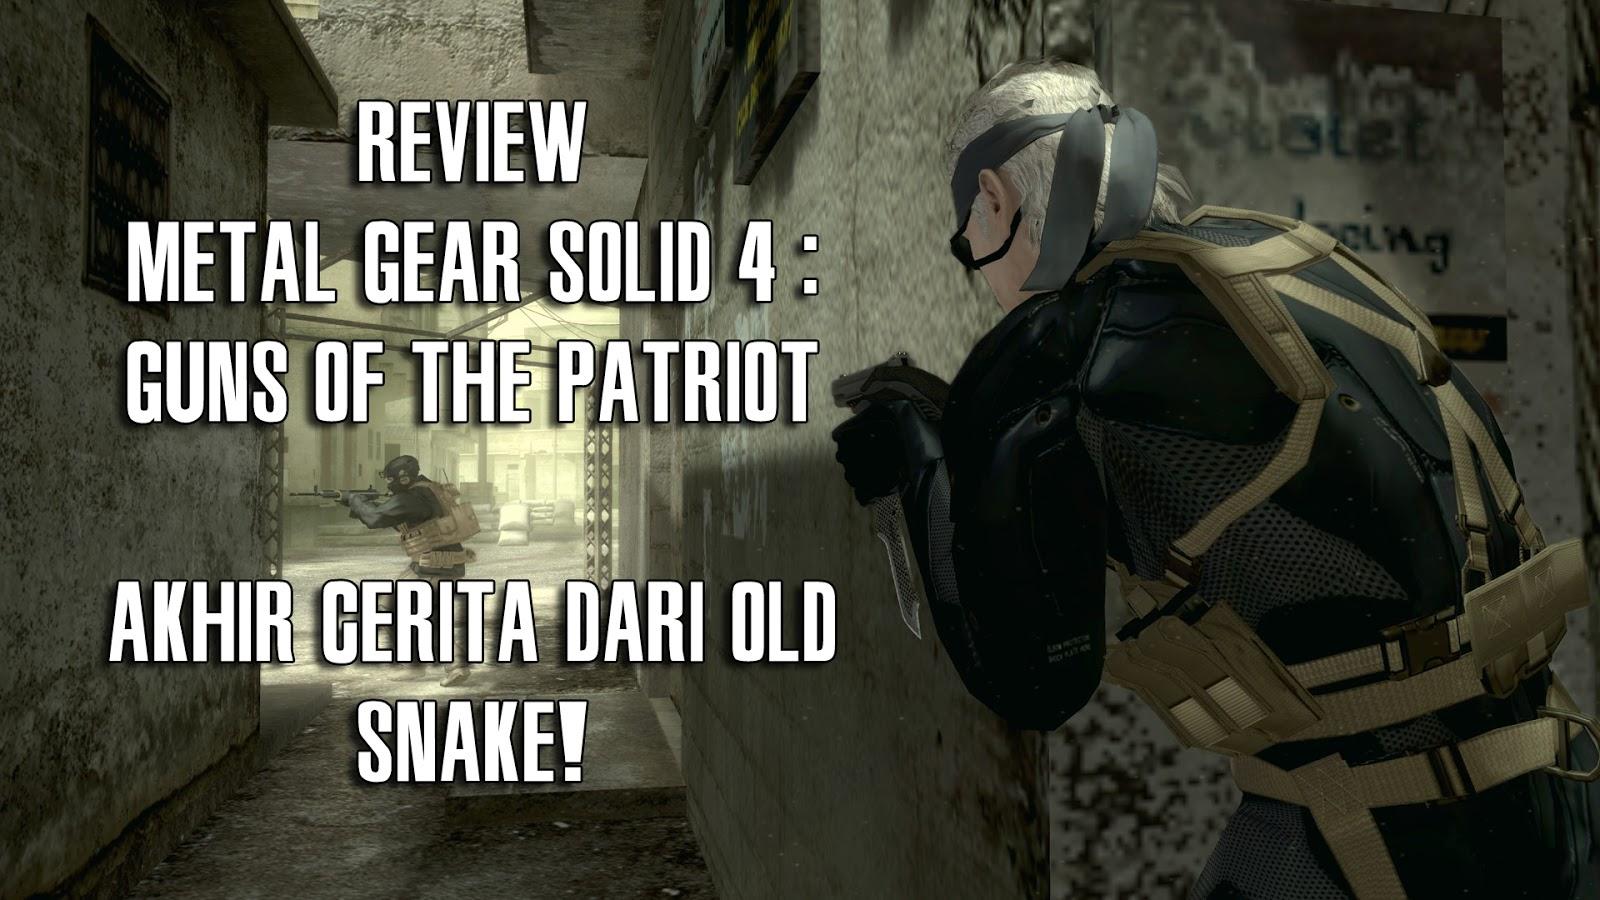 Review Metal Gear Solid 4 : Guns of the Patriots : Akhir